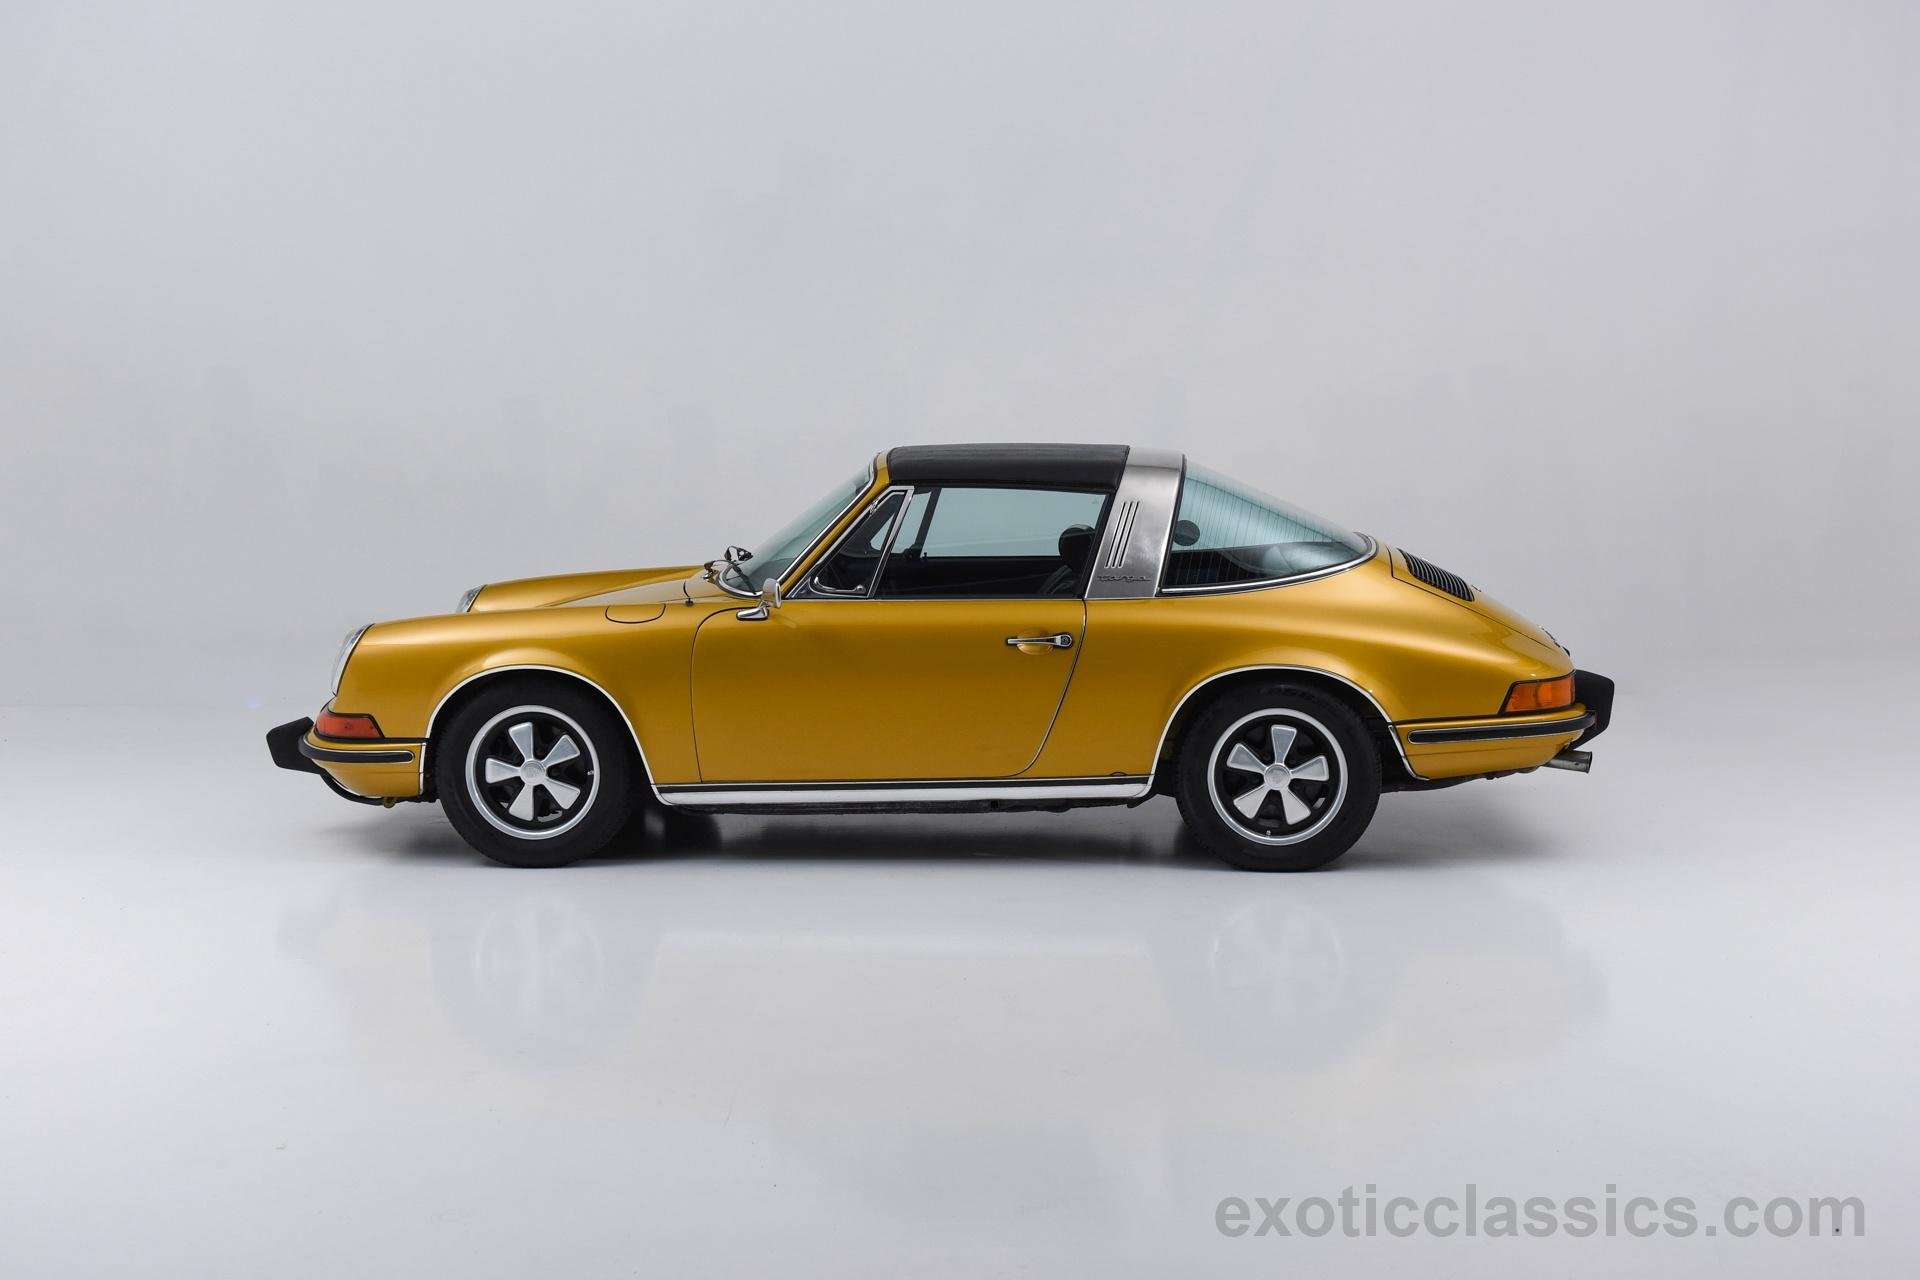 1973 Porsche 911 T Targa Sportomatic Metallic Gold Classic Cars Wallpaper 1920x1280 712171